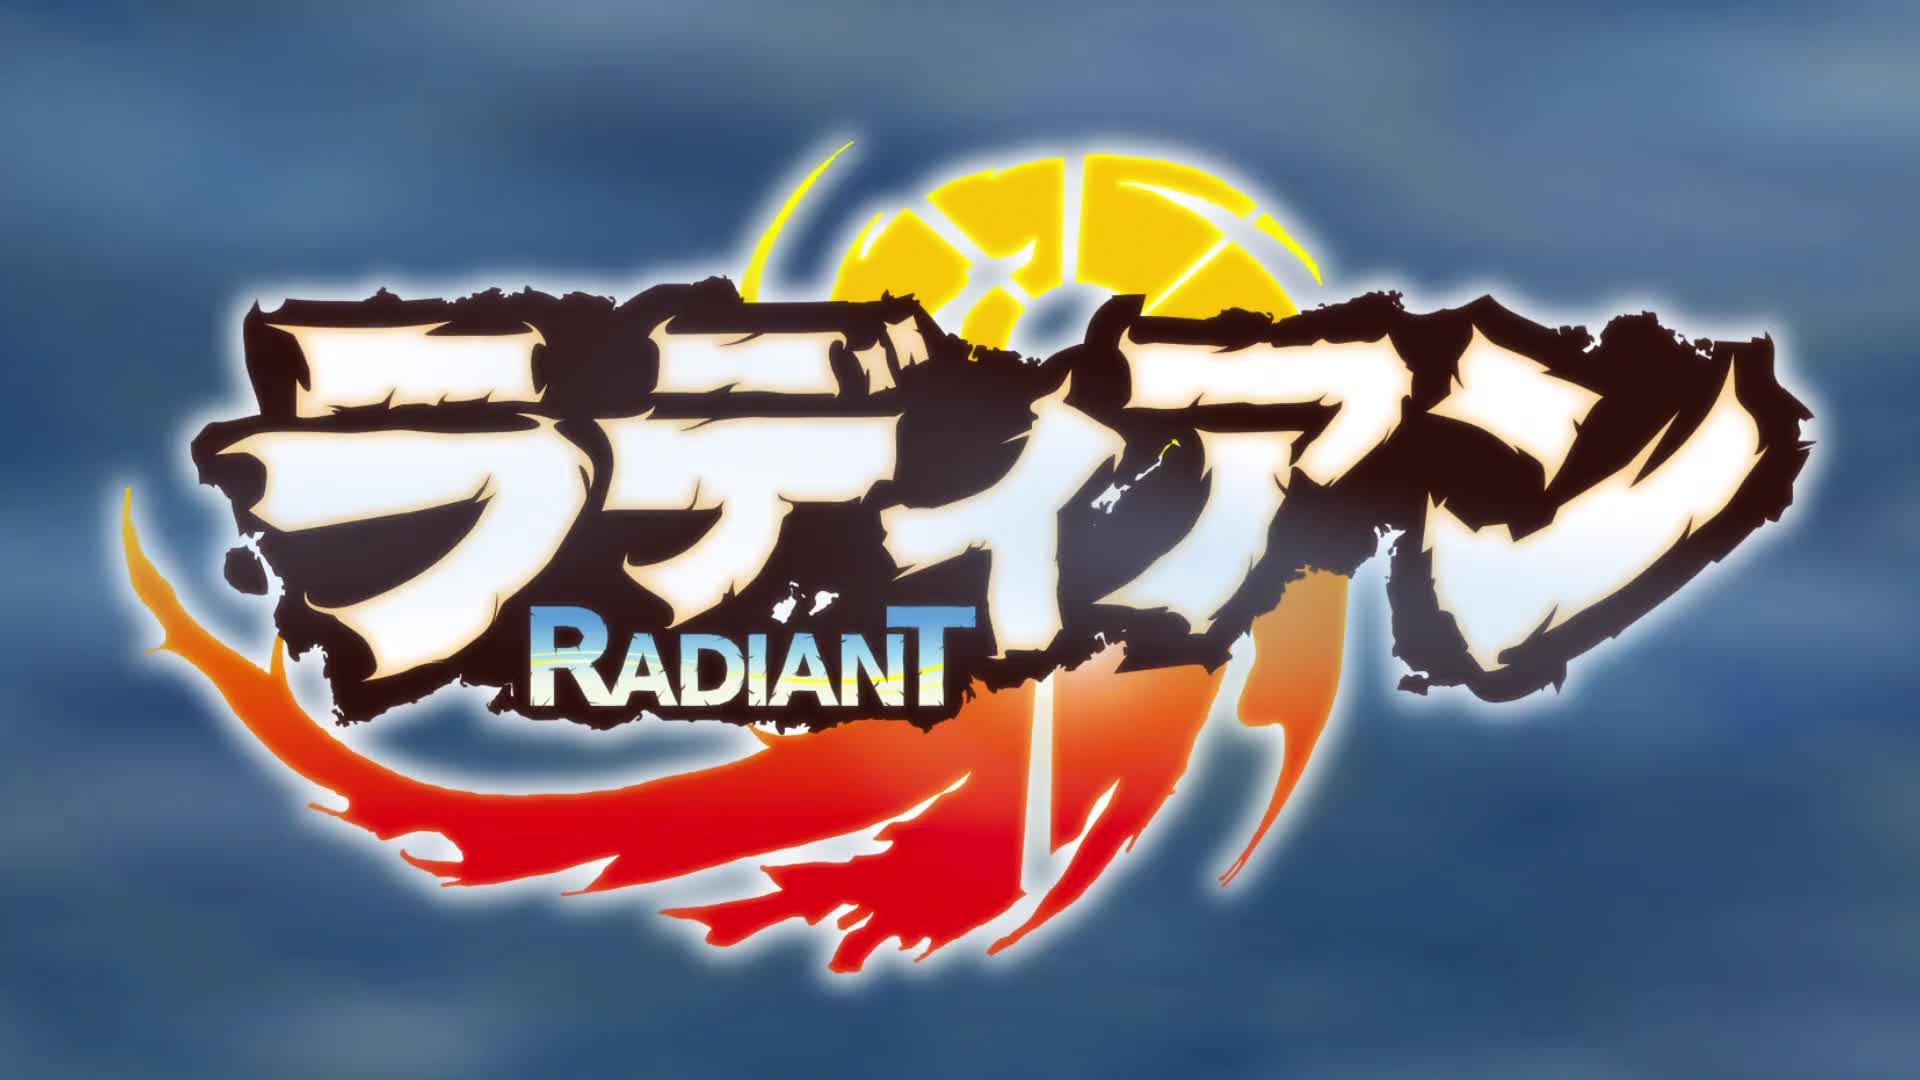 Radiant (Dub)